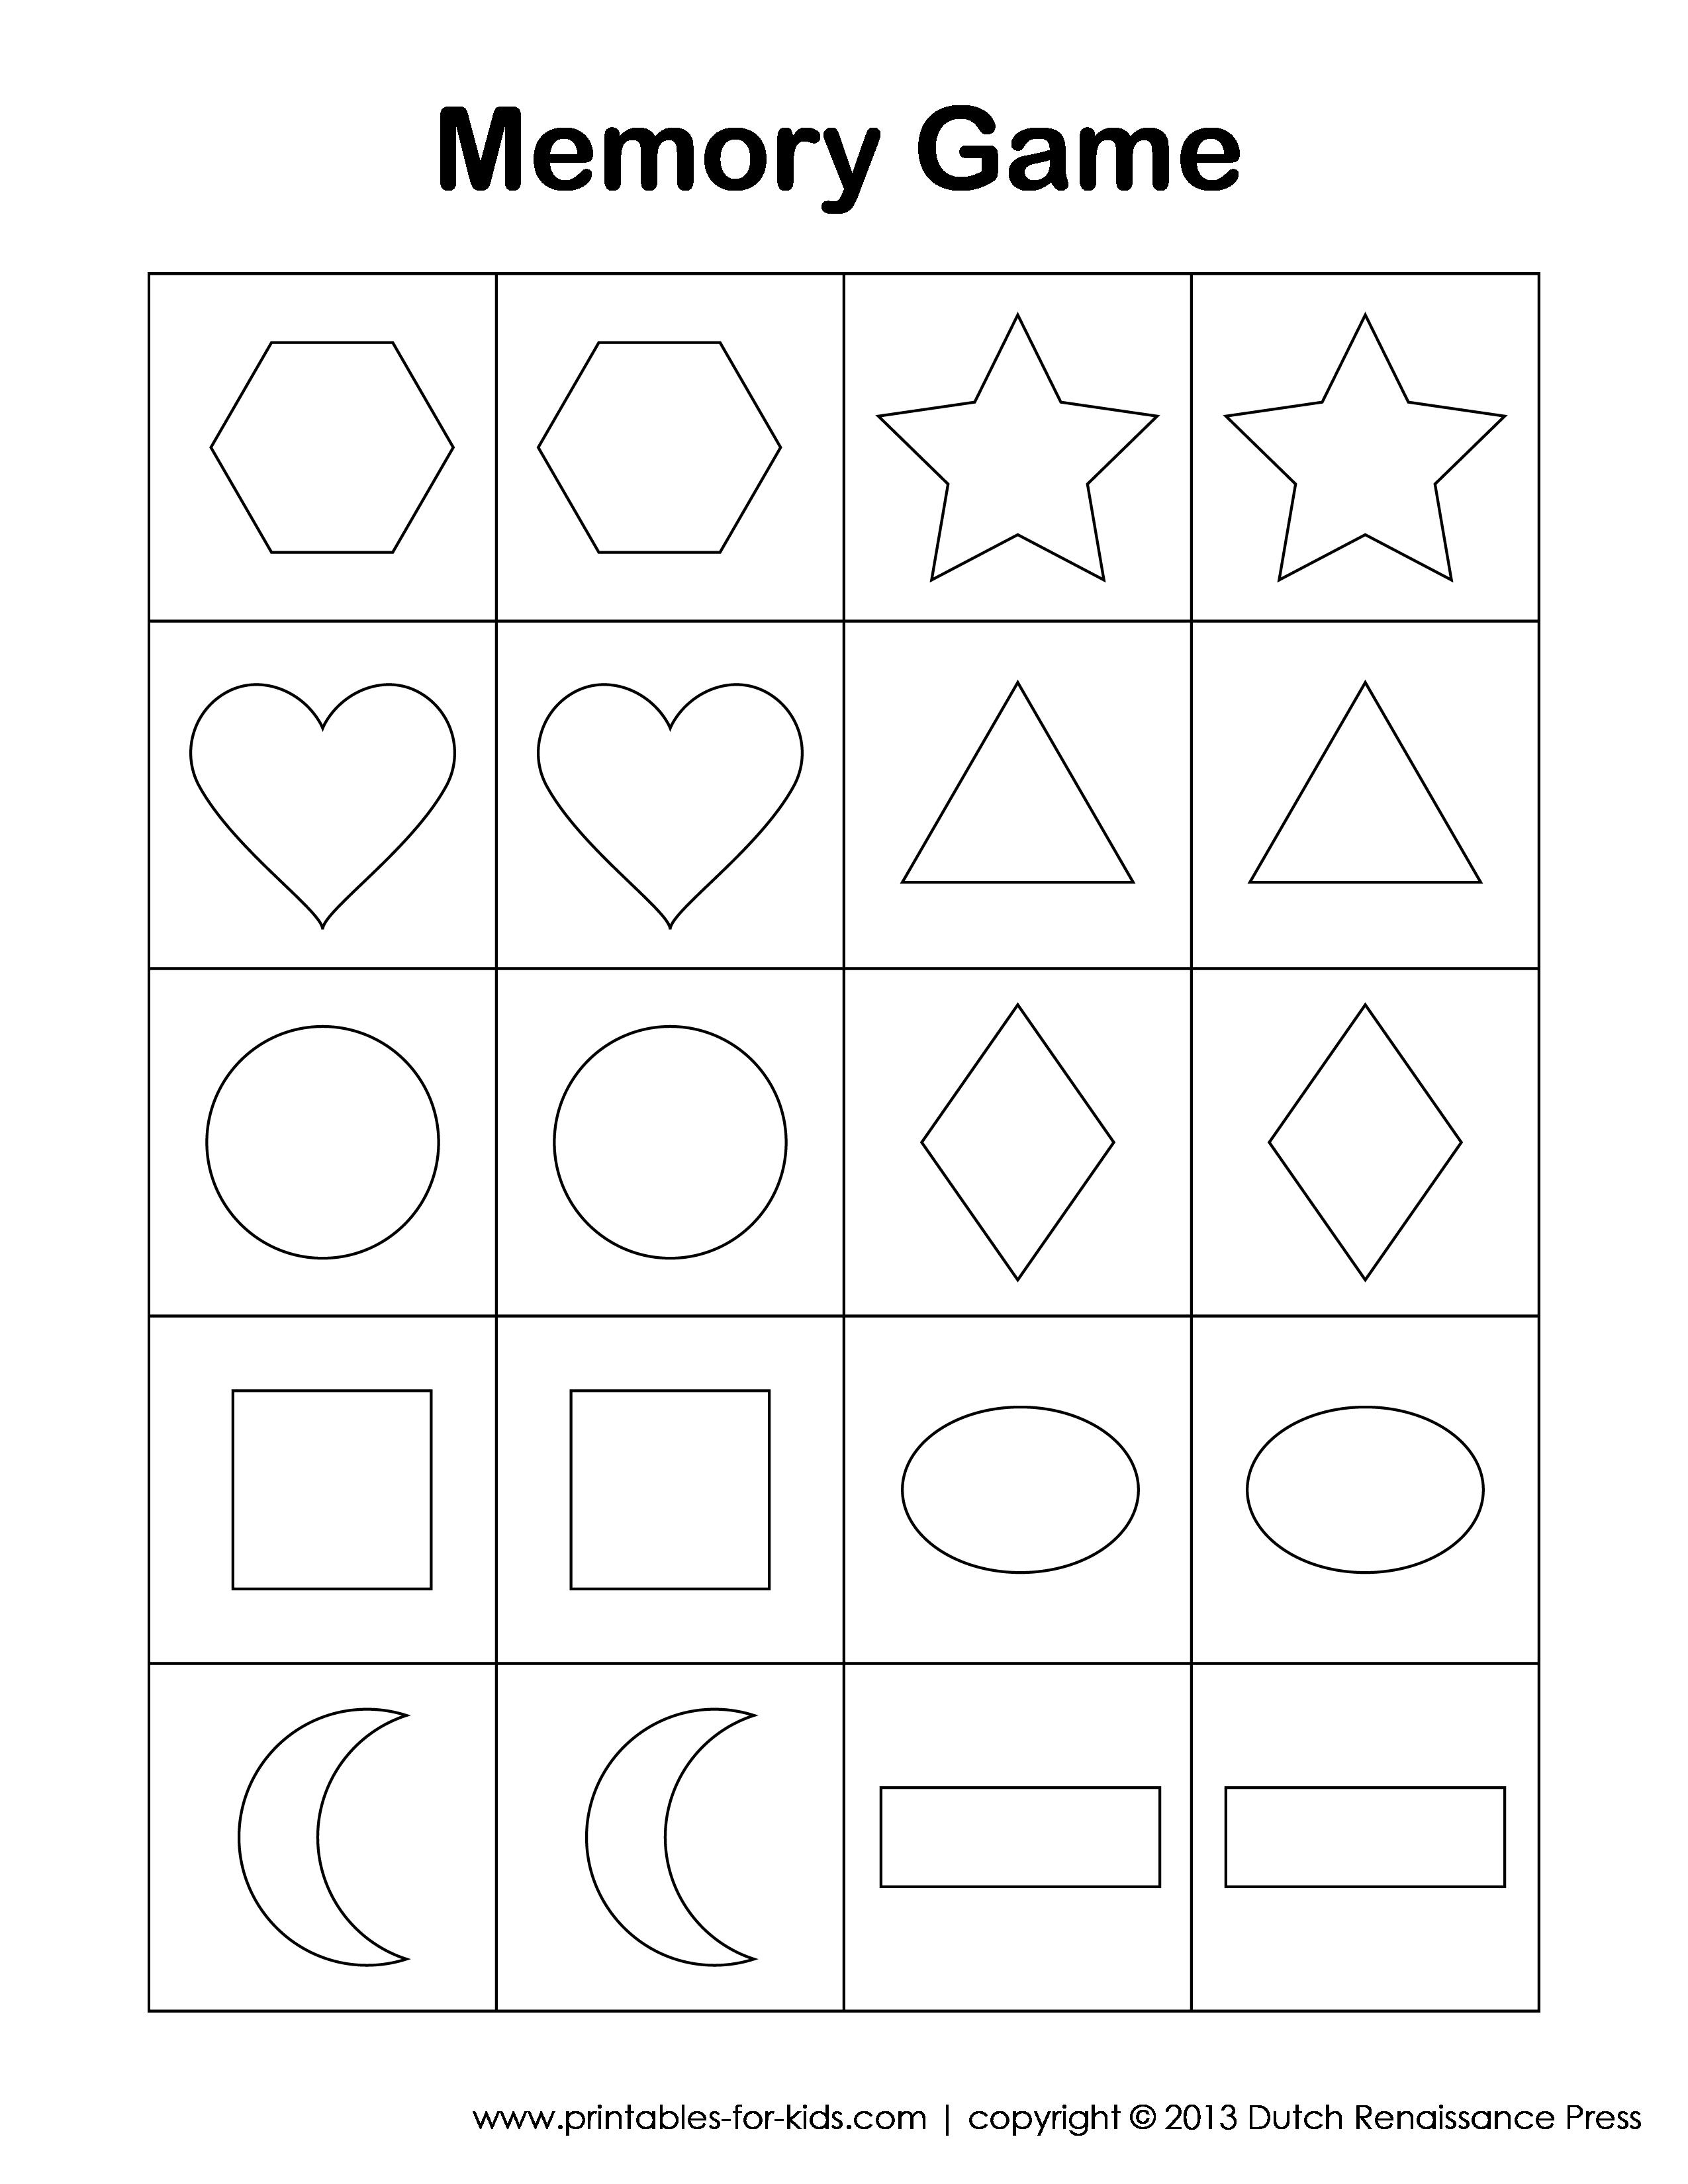 Games clipart memory game. Preschool printable myscres free